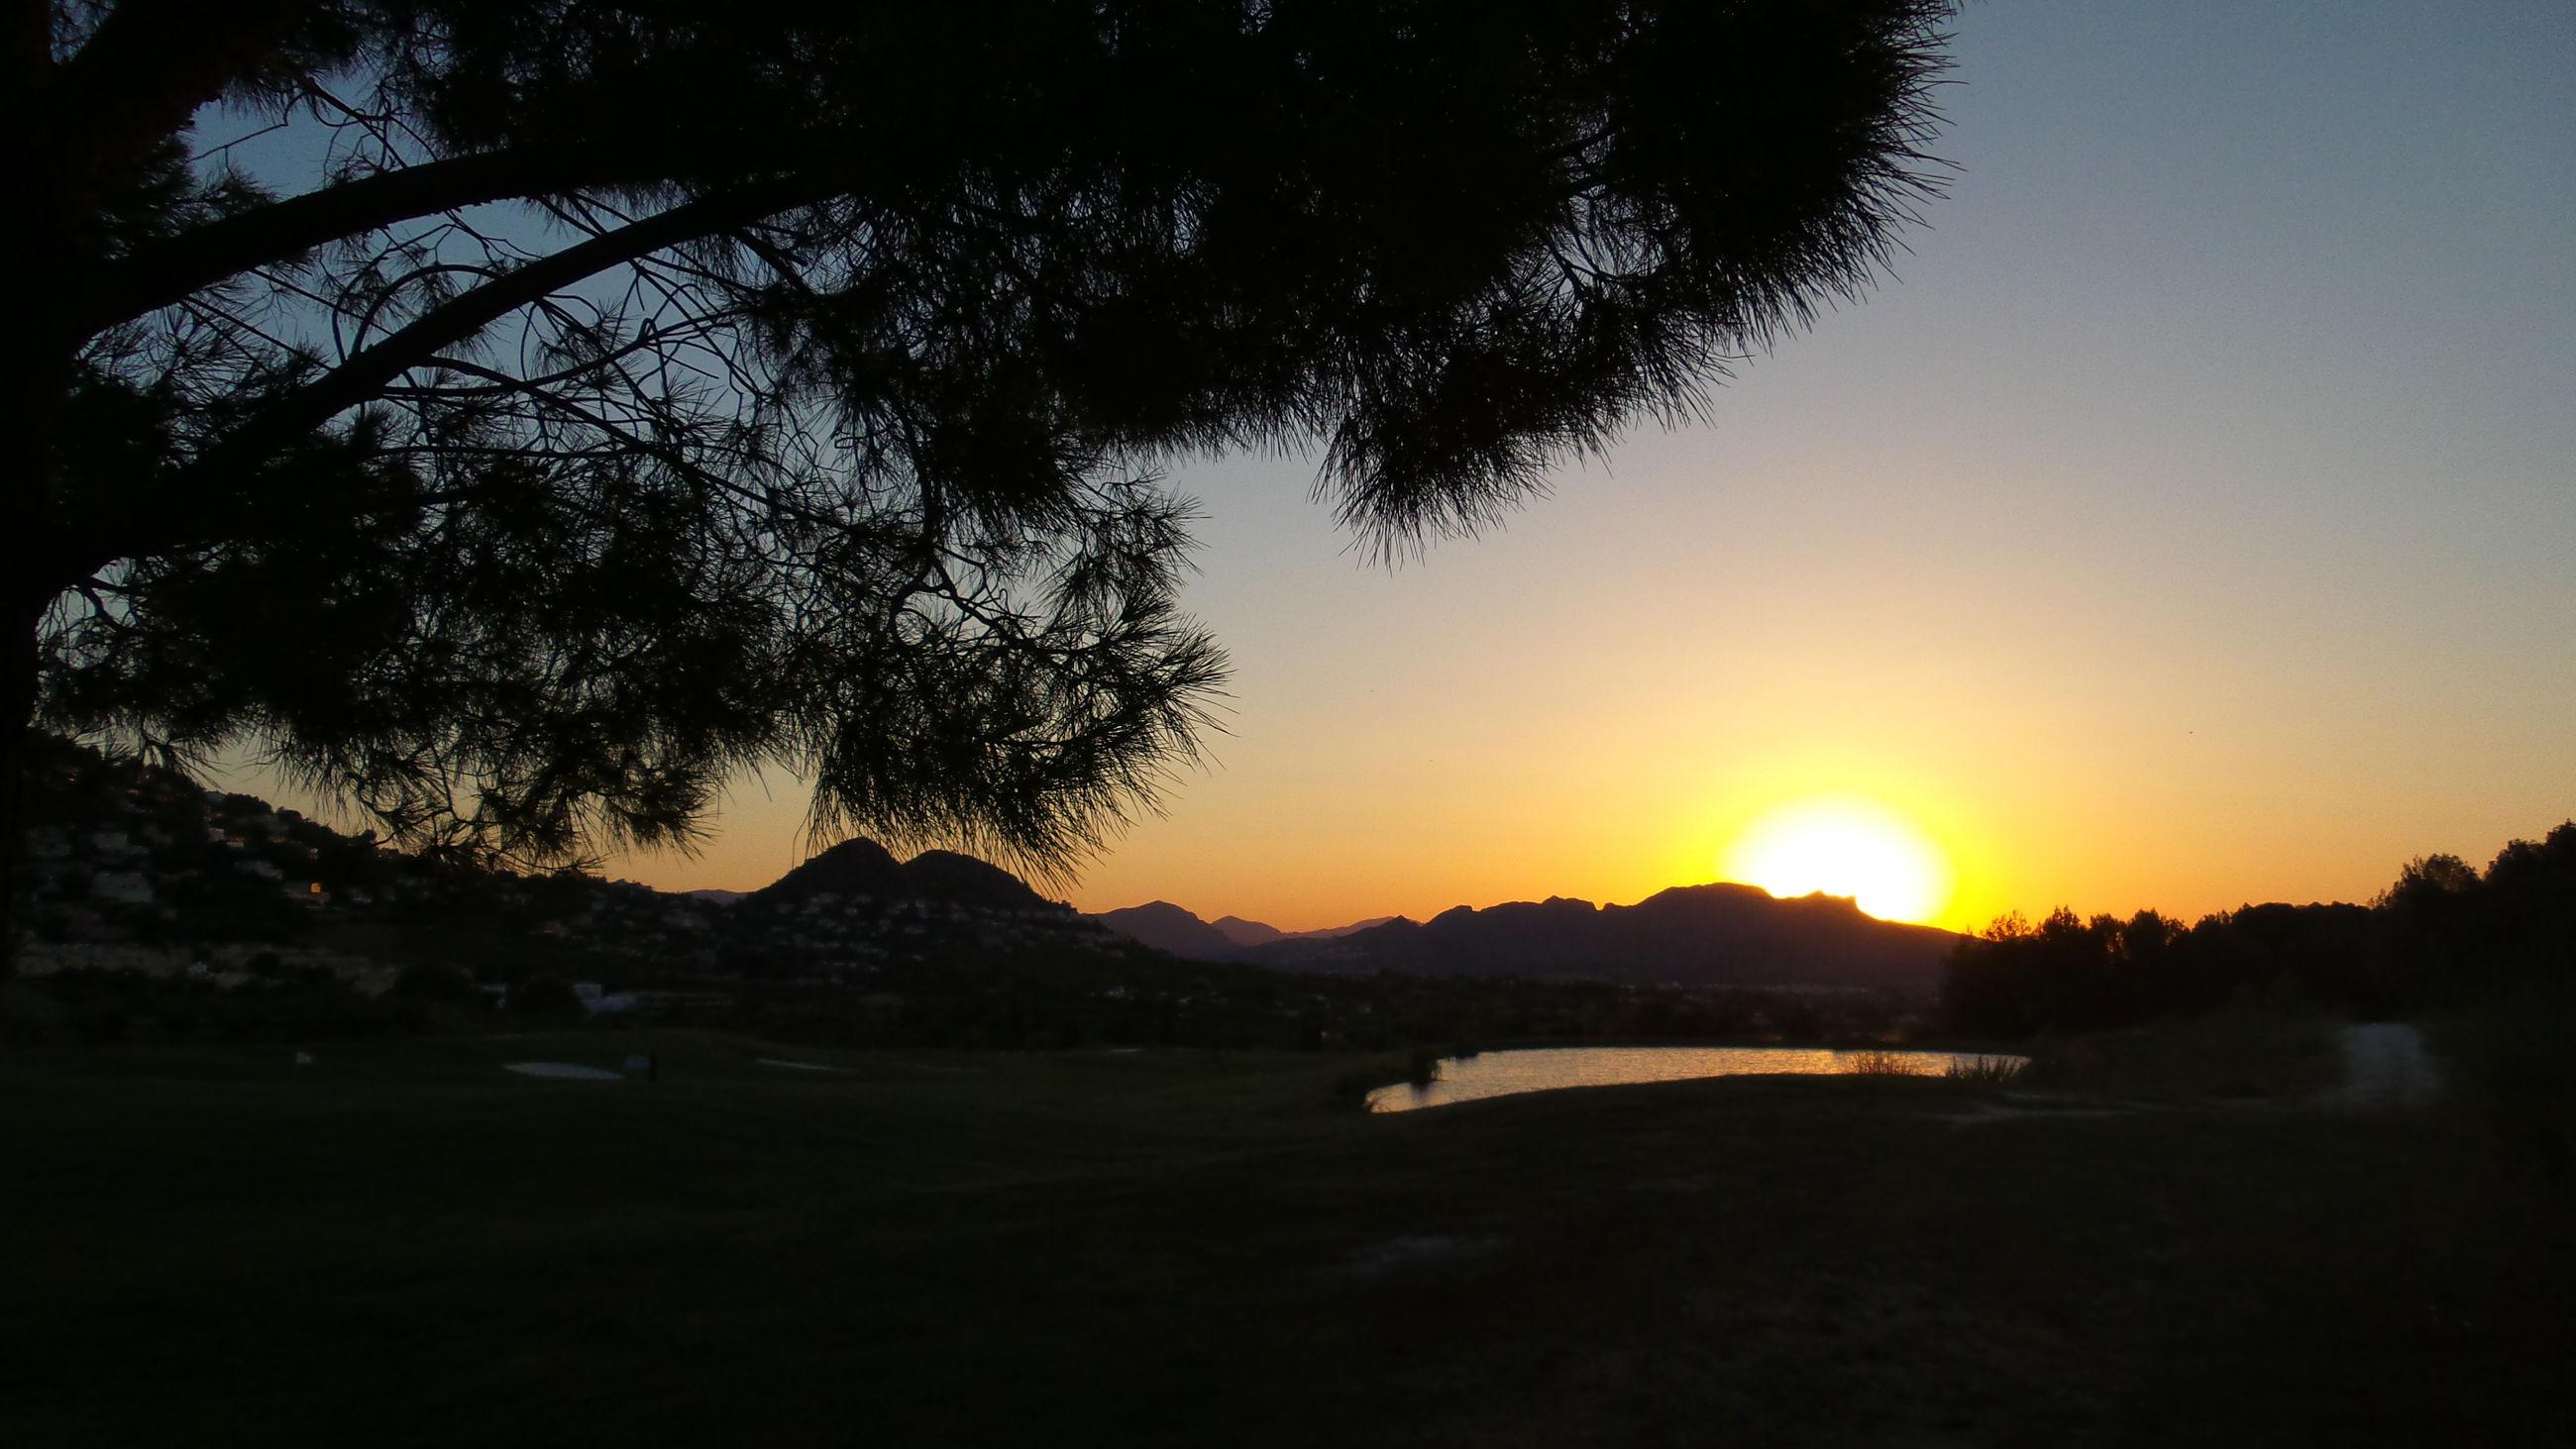 sunset, tranquil scene, scenics, tranquility, silhouette, tree, sun, beauty in nature, water, orange color, nature, sky, idyllic, mountain, sunlight, lake, landscape, river, non-urban scene, outdoors